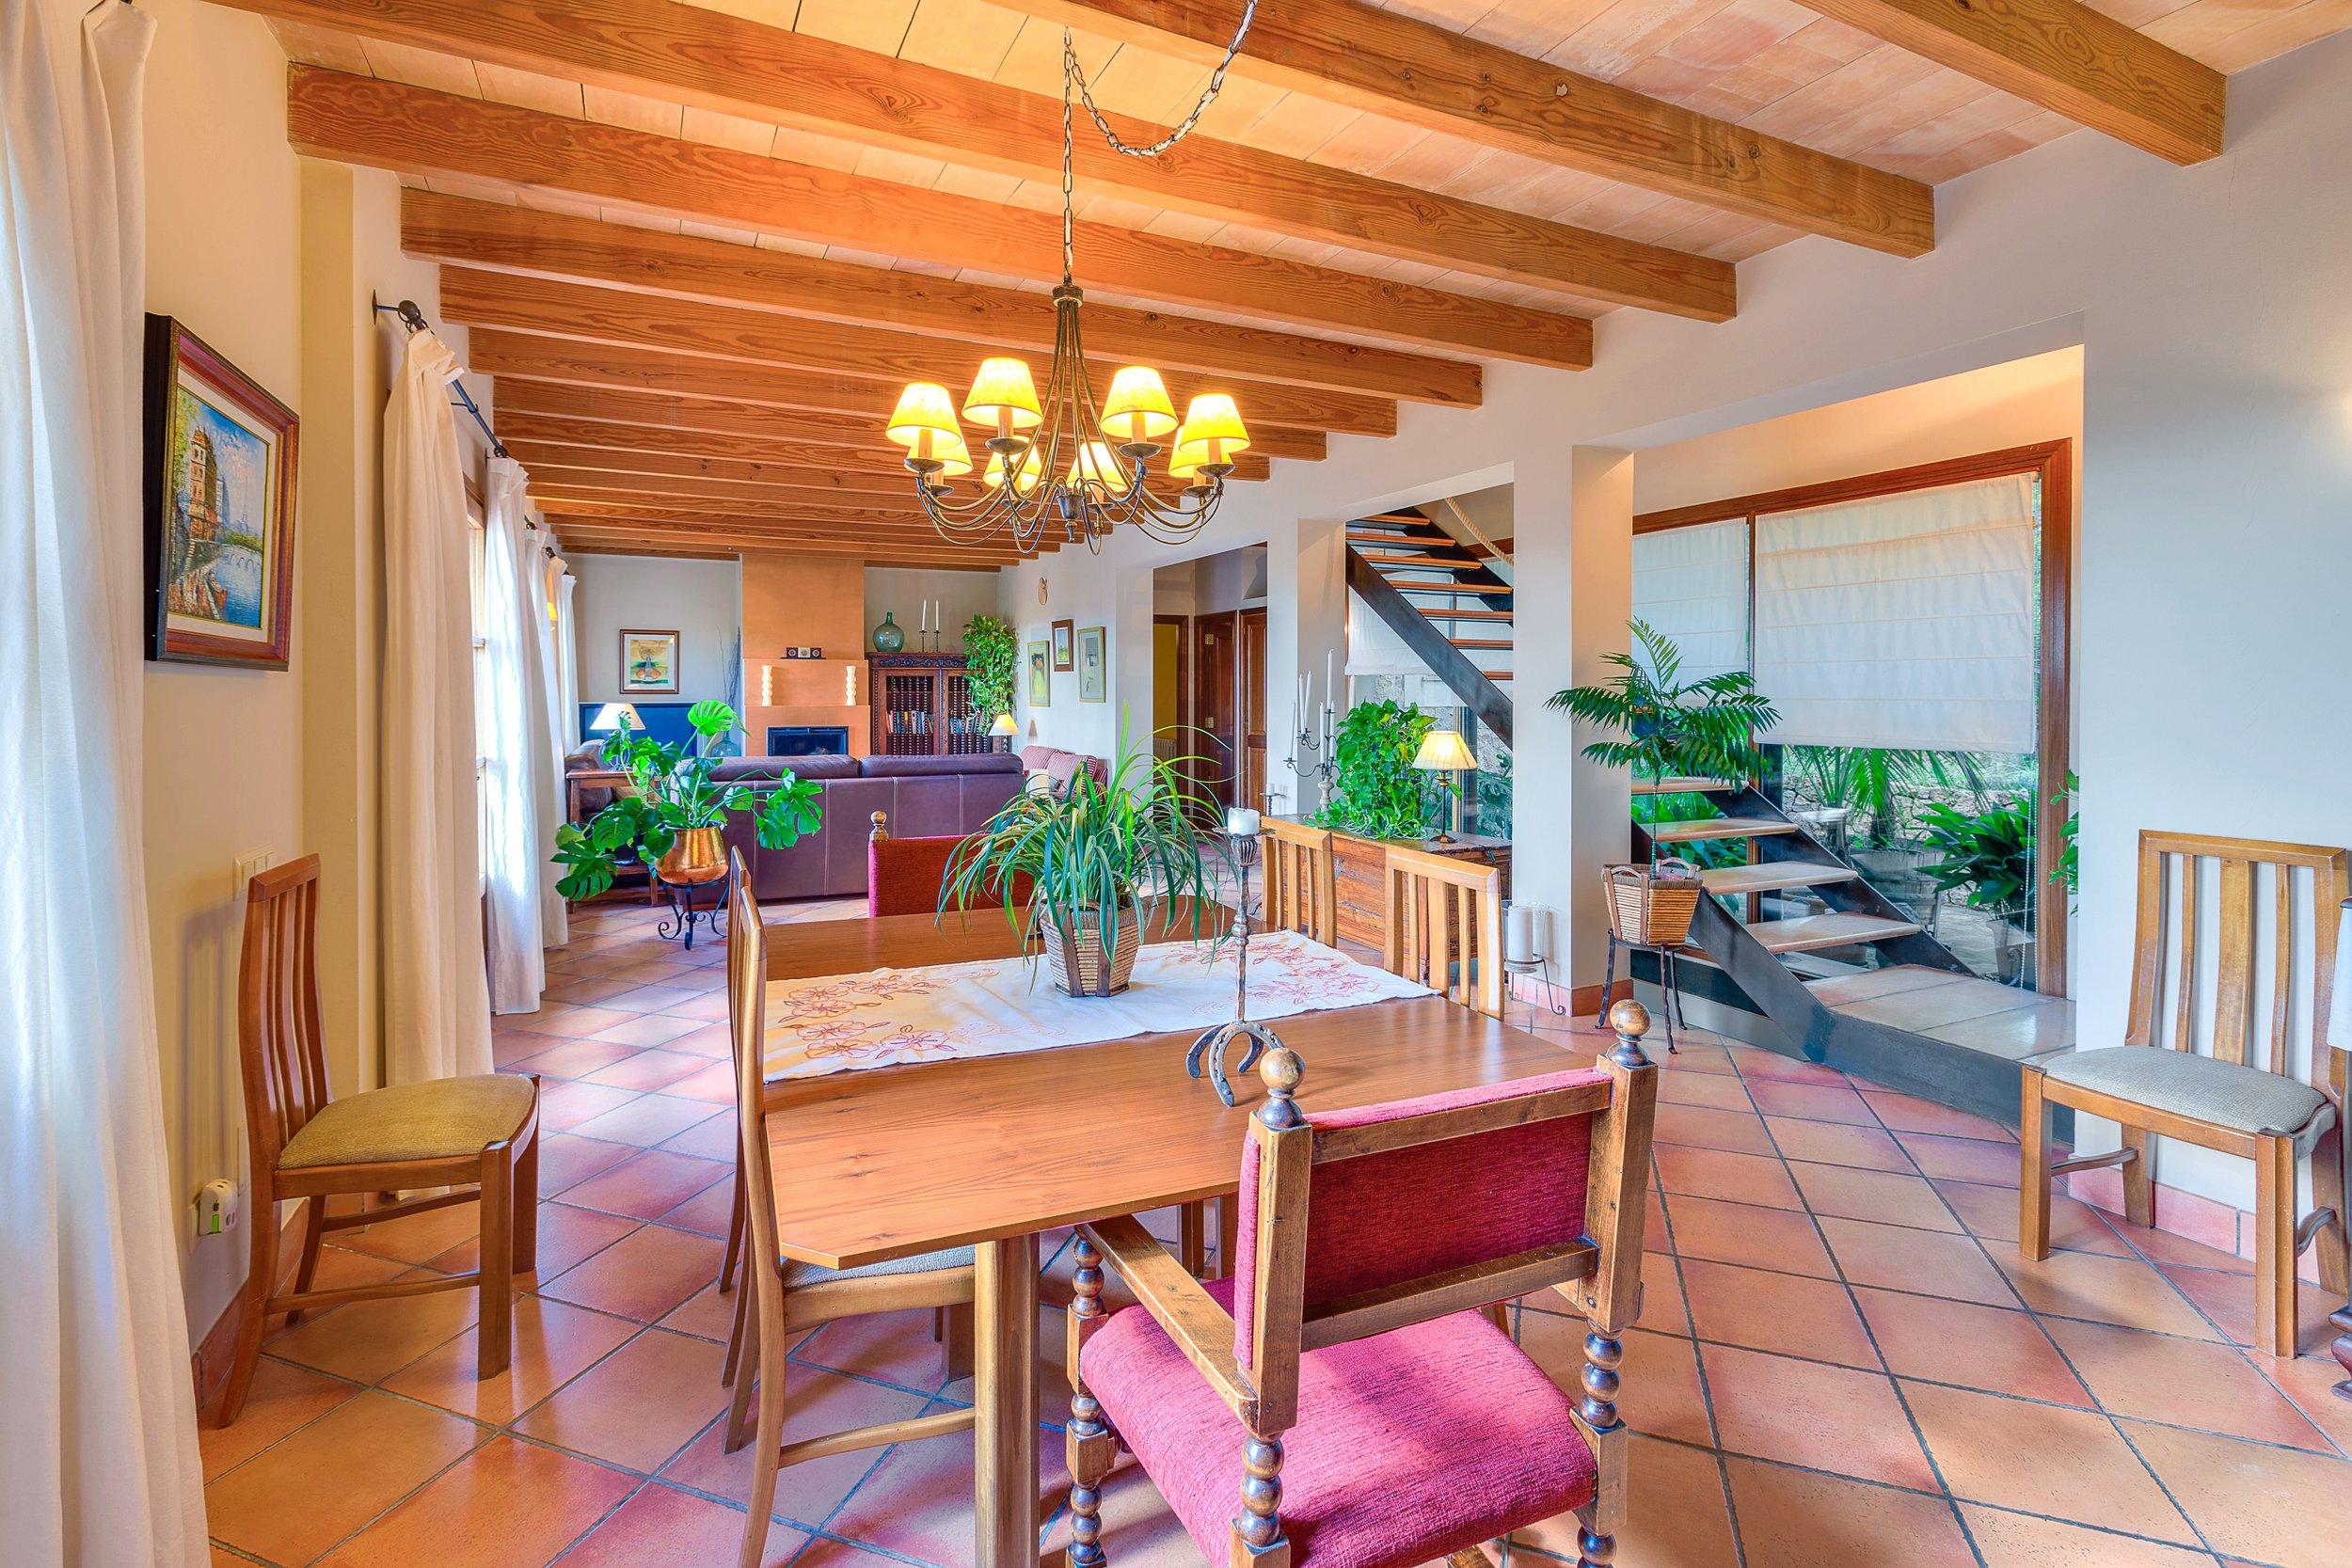 Maison de vacances Villa Cirera in Alaro (2611793), Alaro, Majorque, Iles Baléares, Espagne, image 13